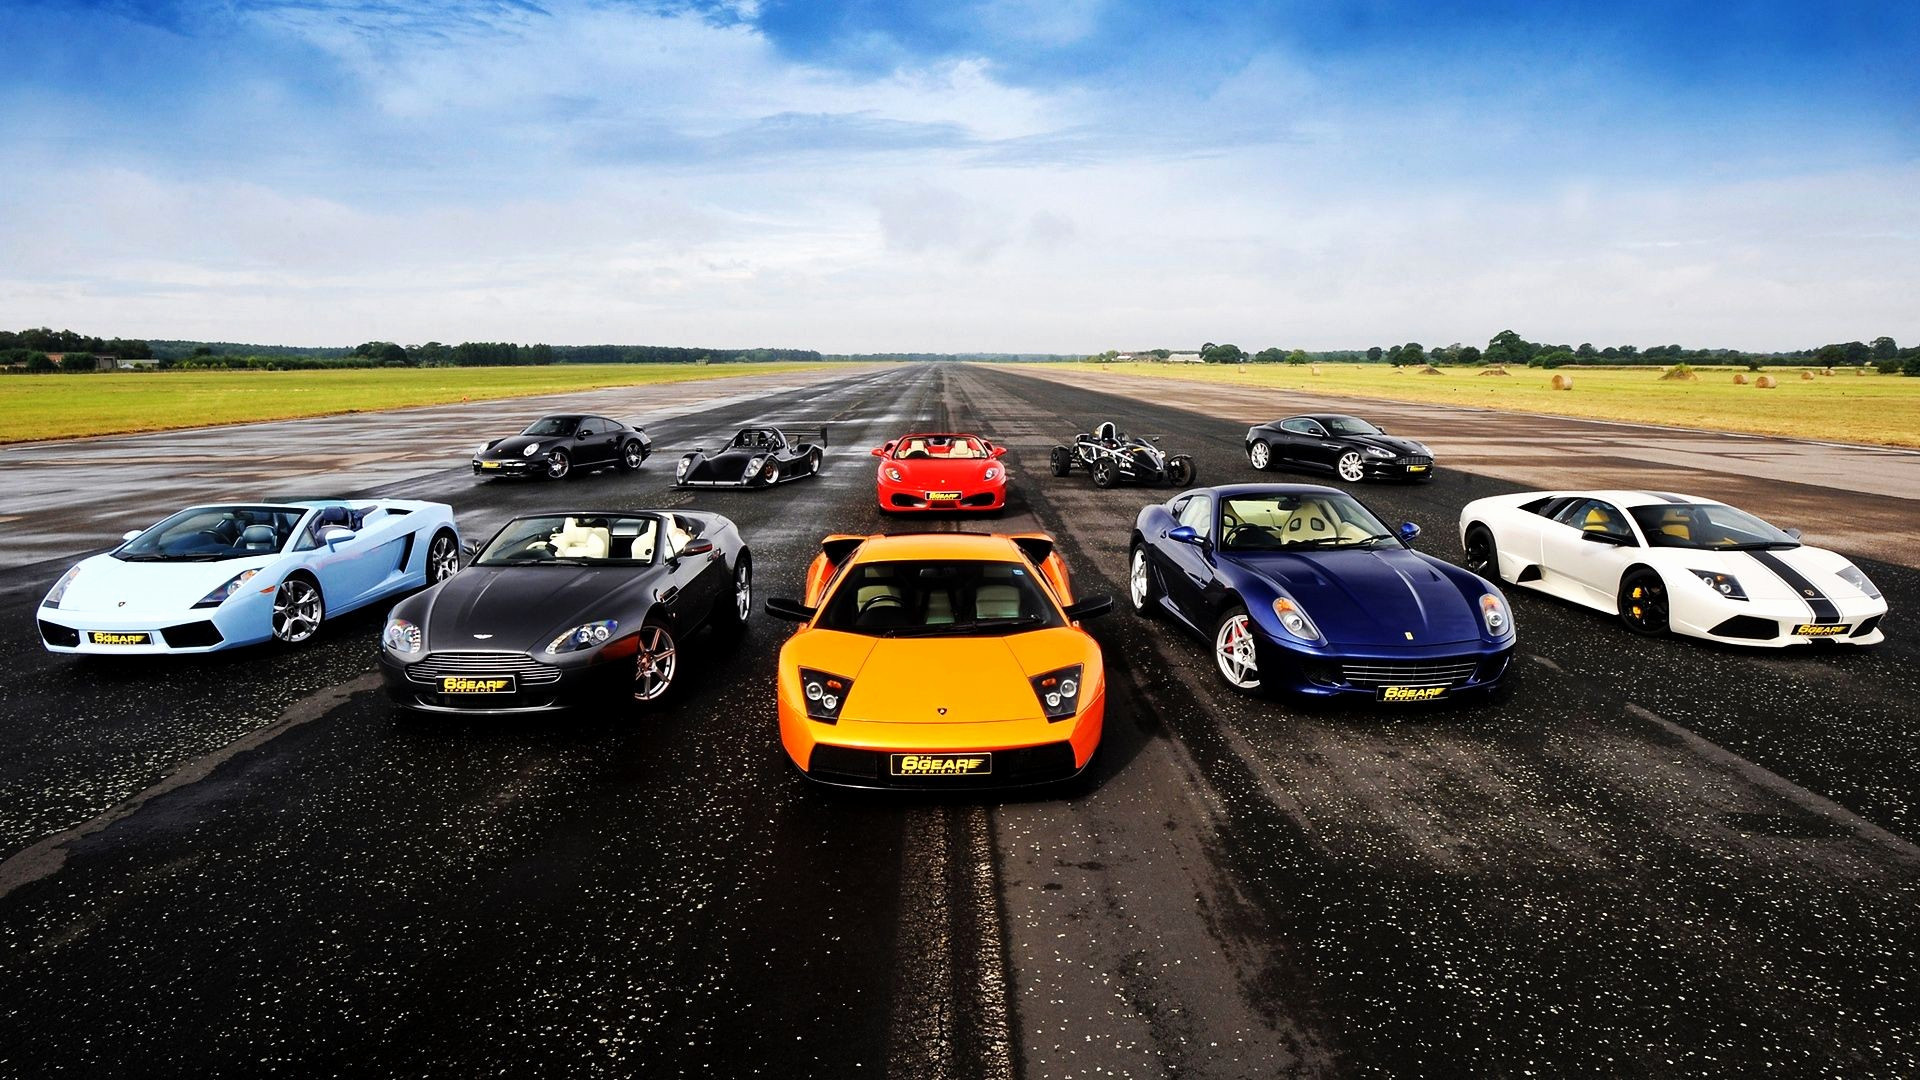 Full Hd Sports Car Wallpaper 61 Images